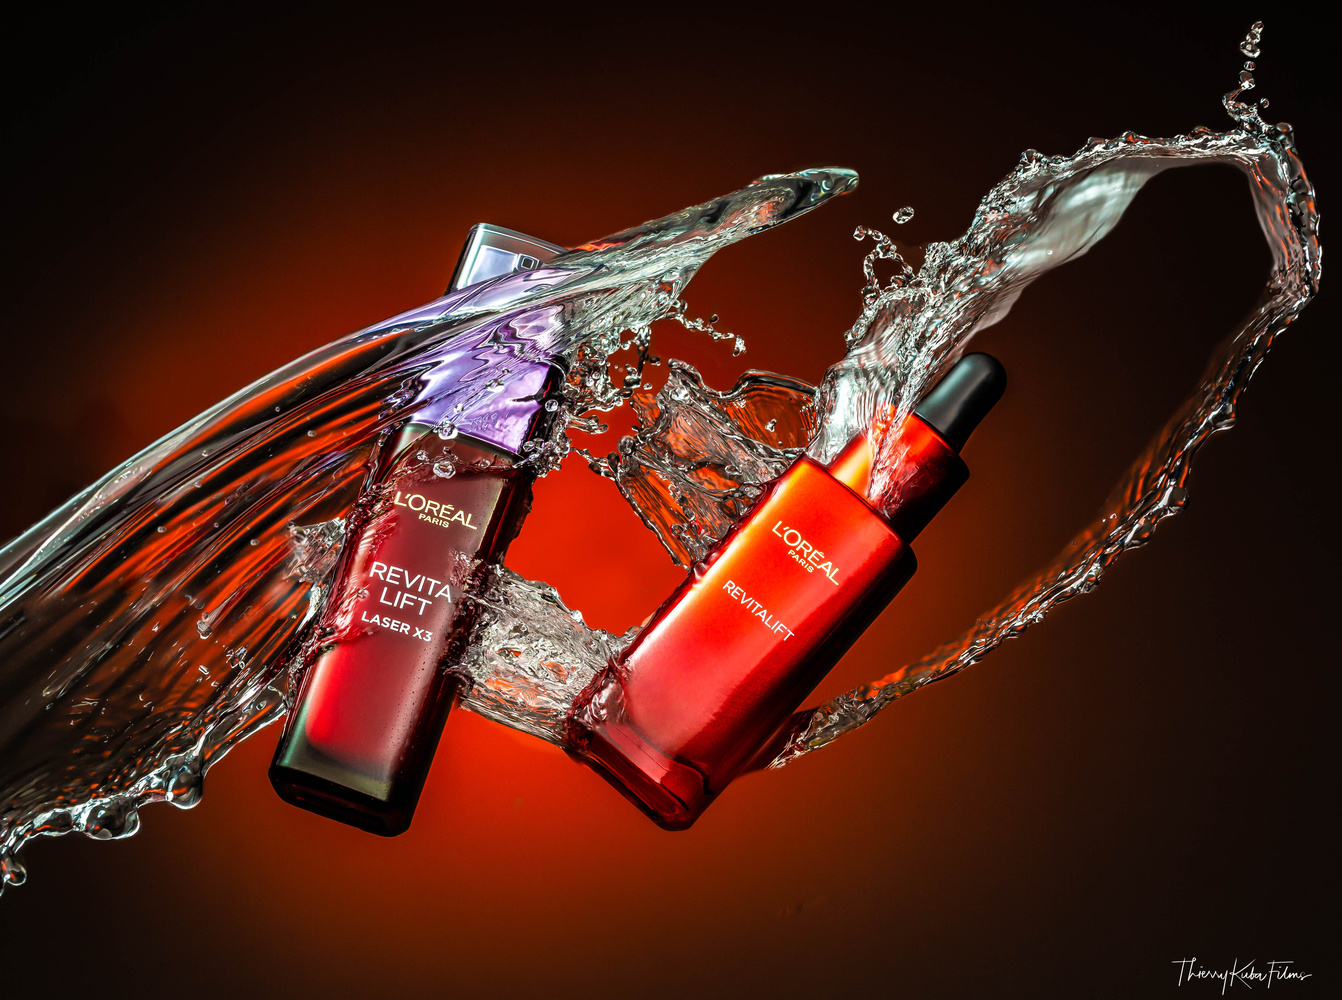 Product splash by Thierry KUBA